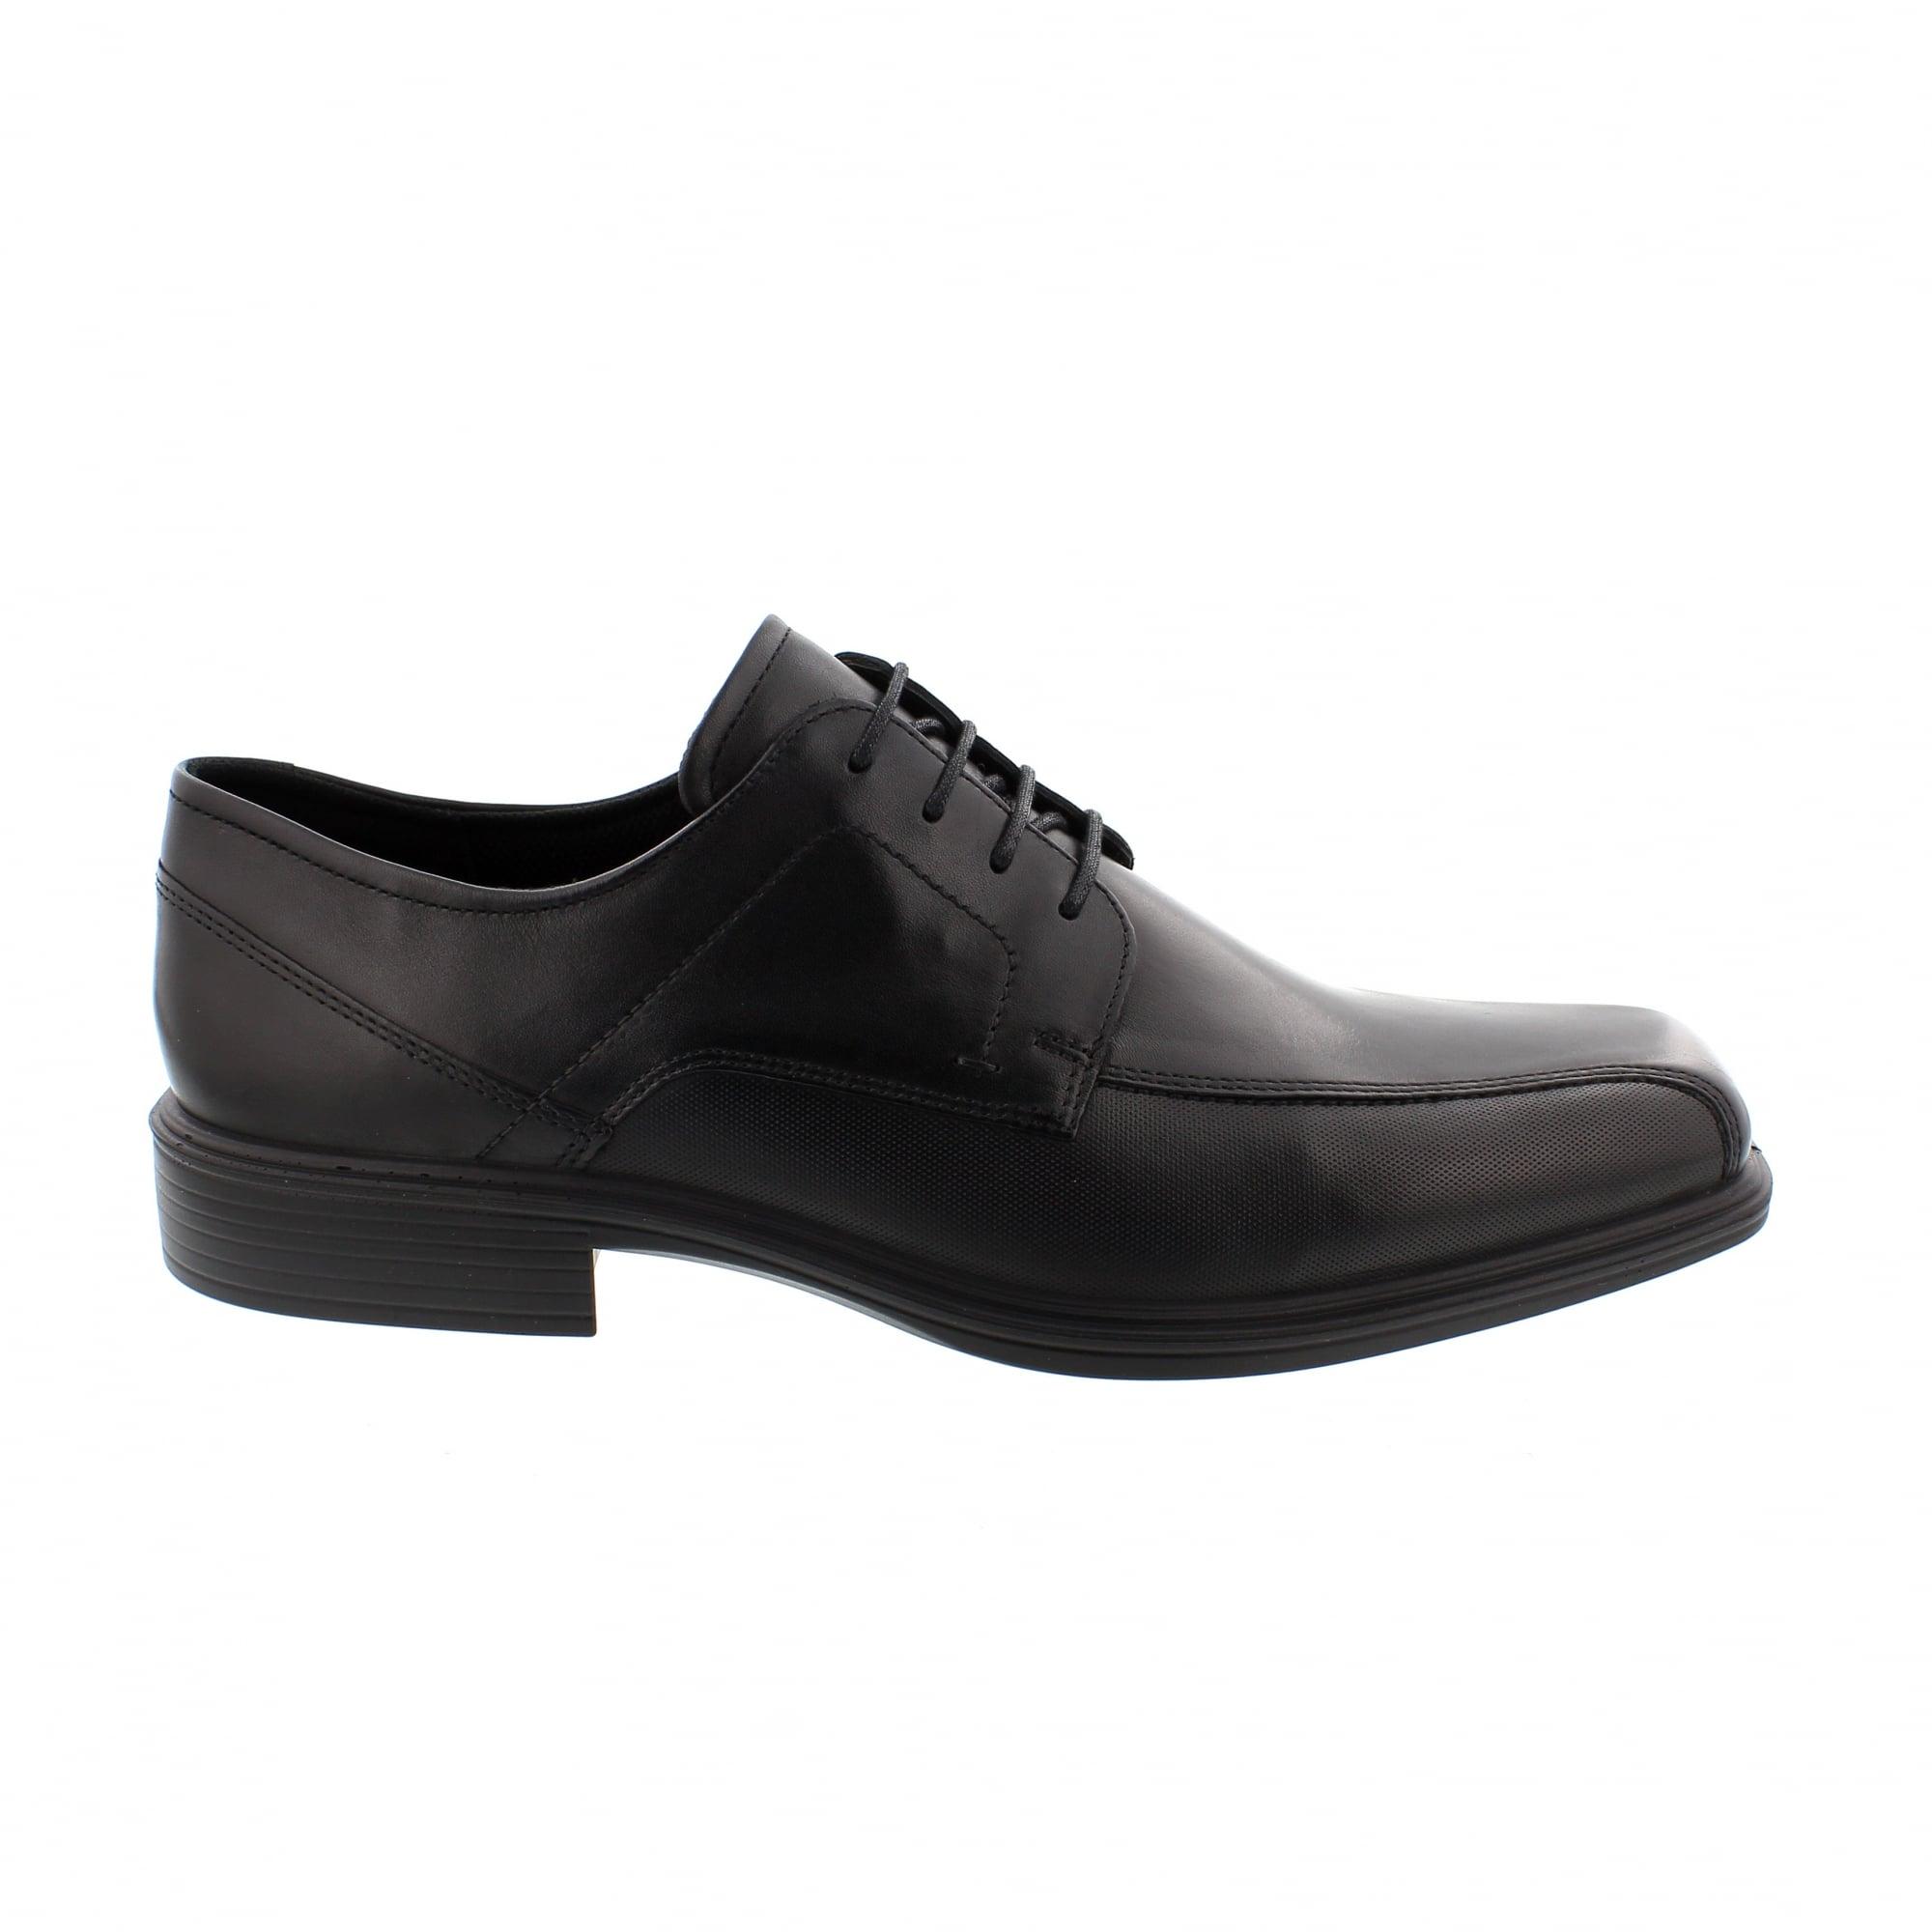 804b3b991e62 Ecco Johannesburg 623544-01001 Mens Shoes